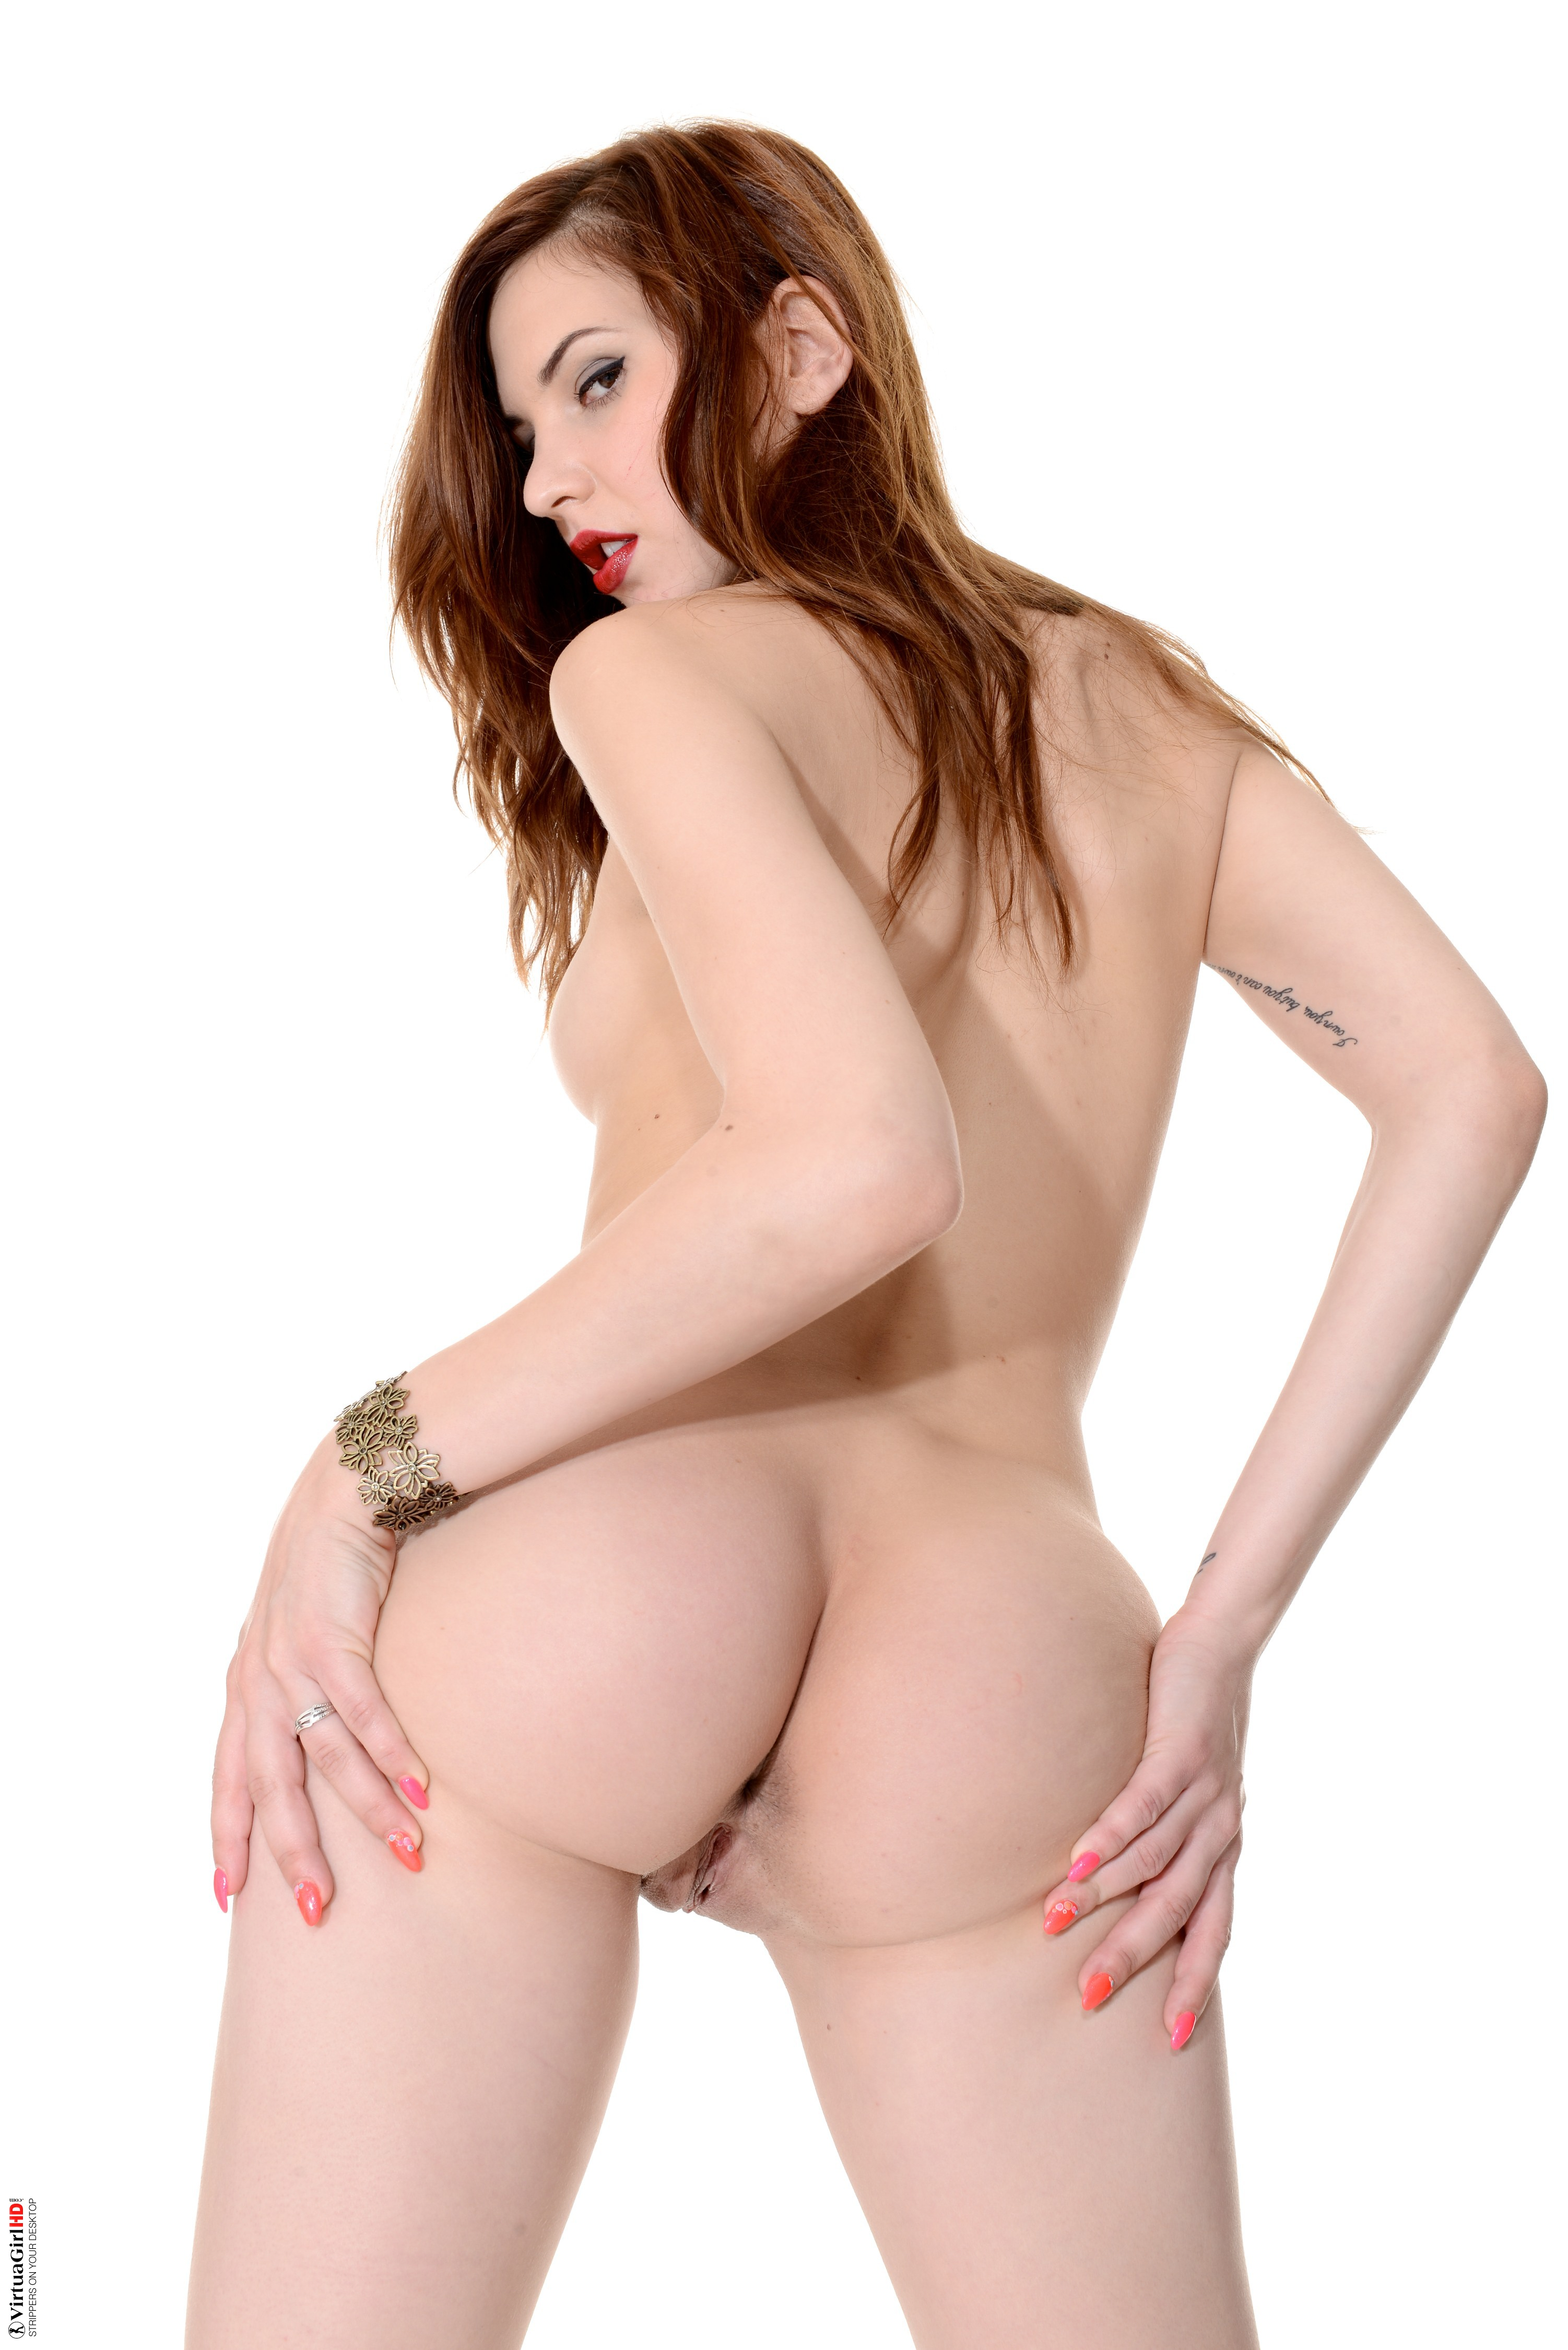 naked girls screensavers